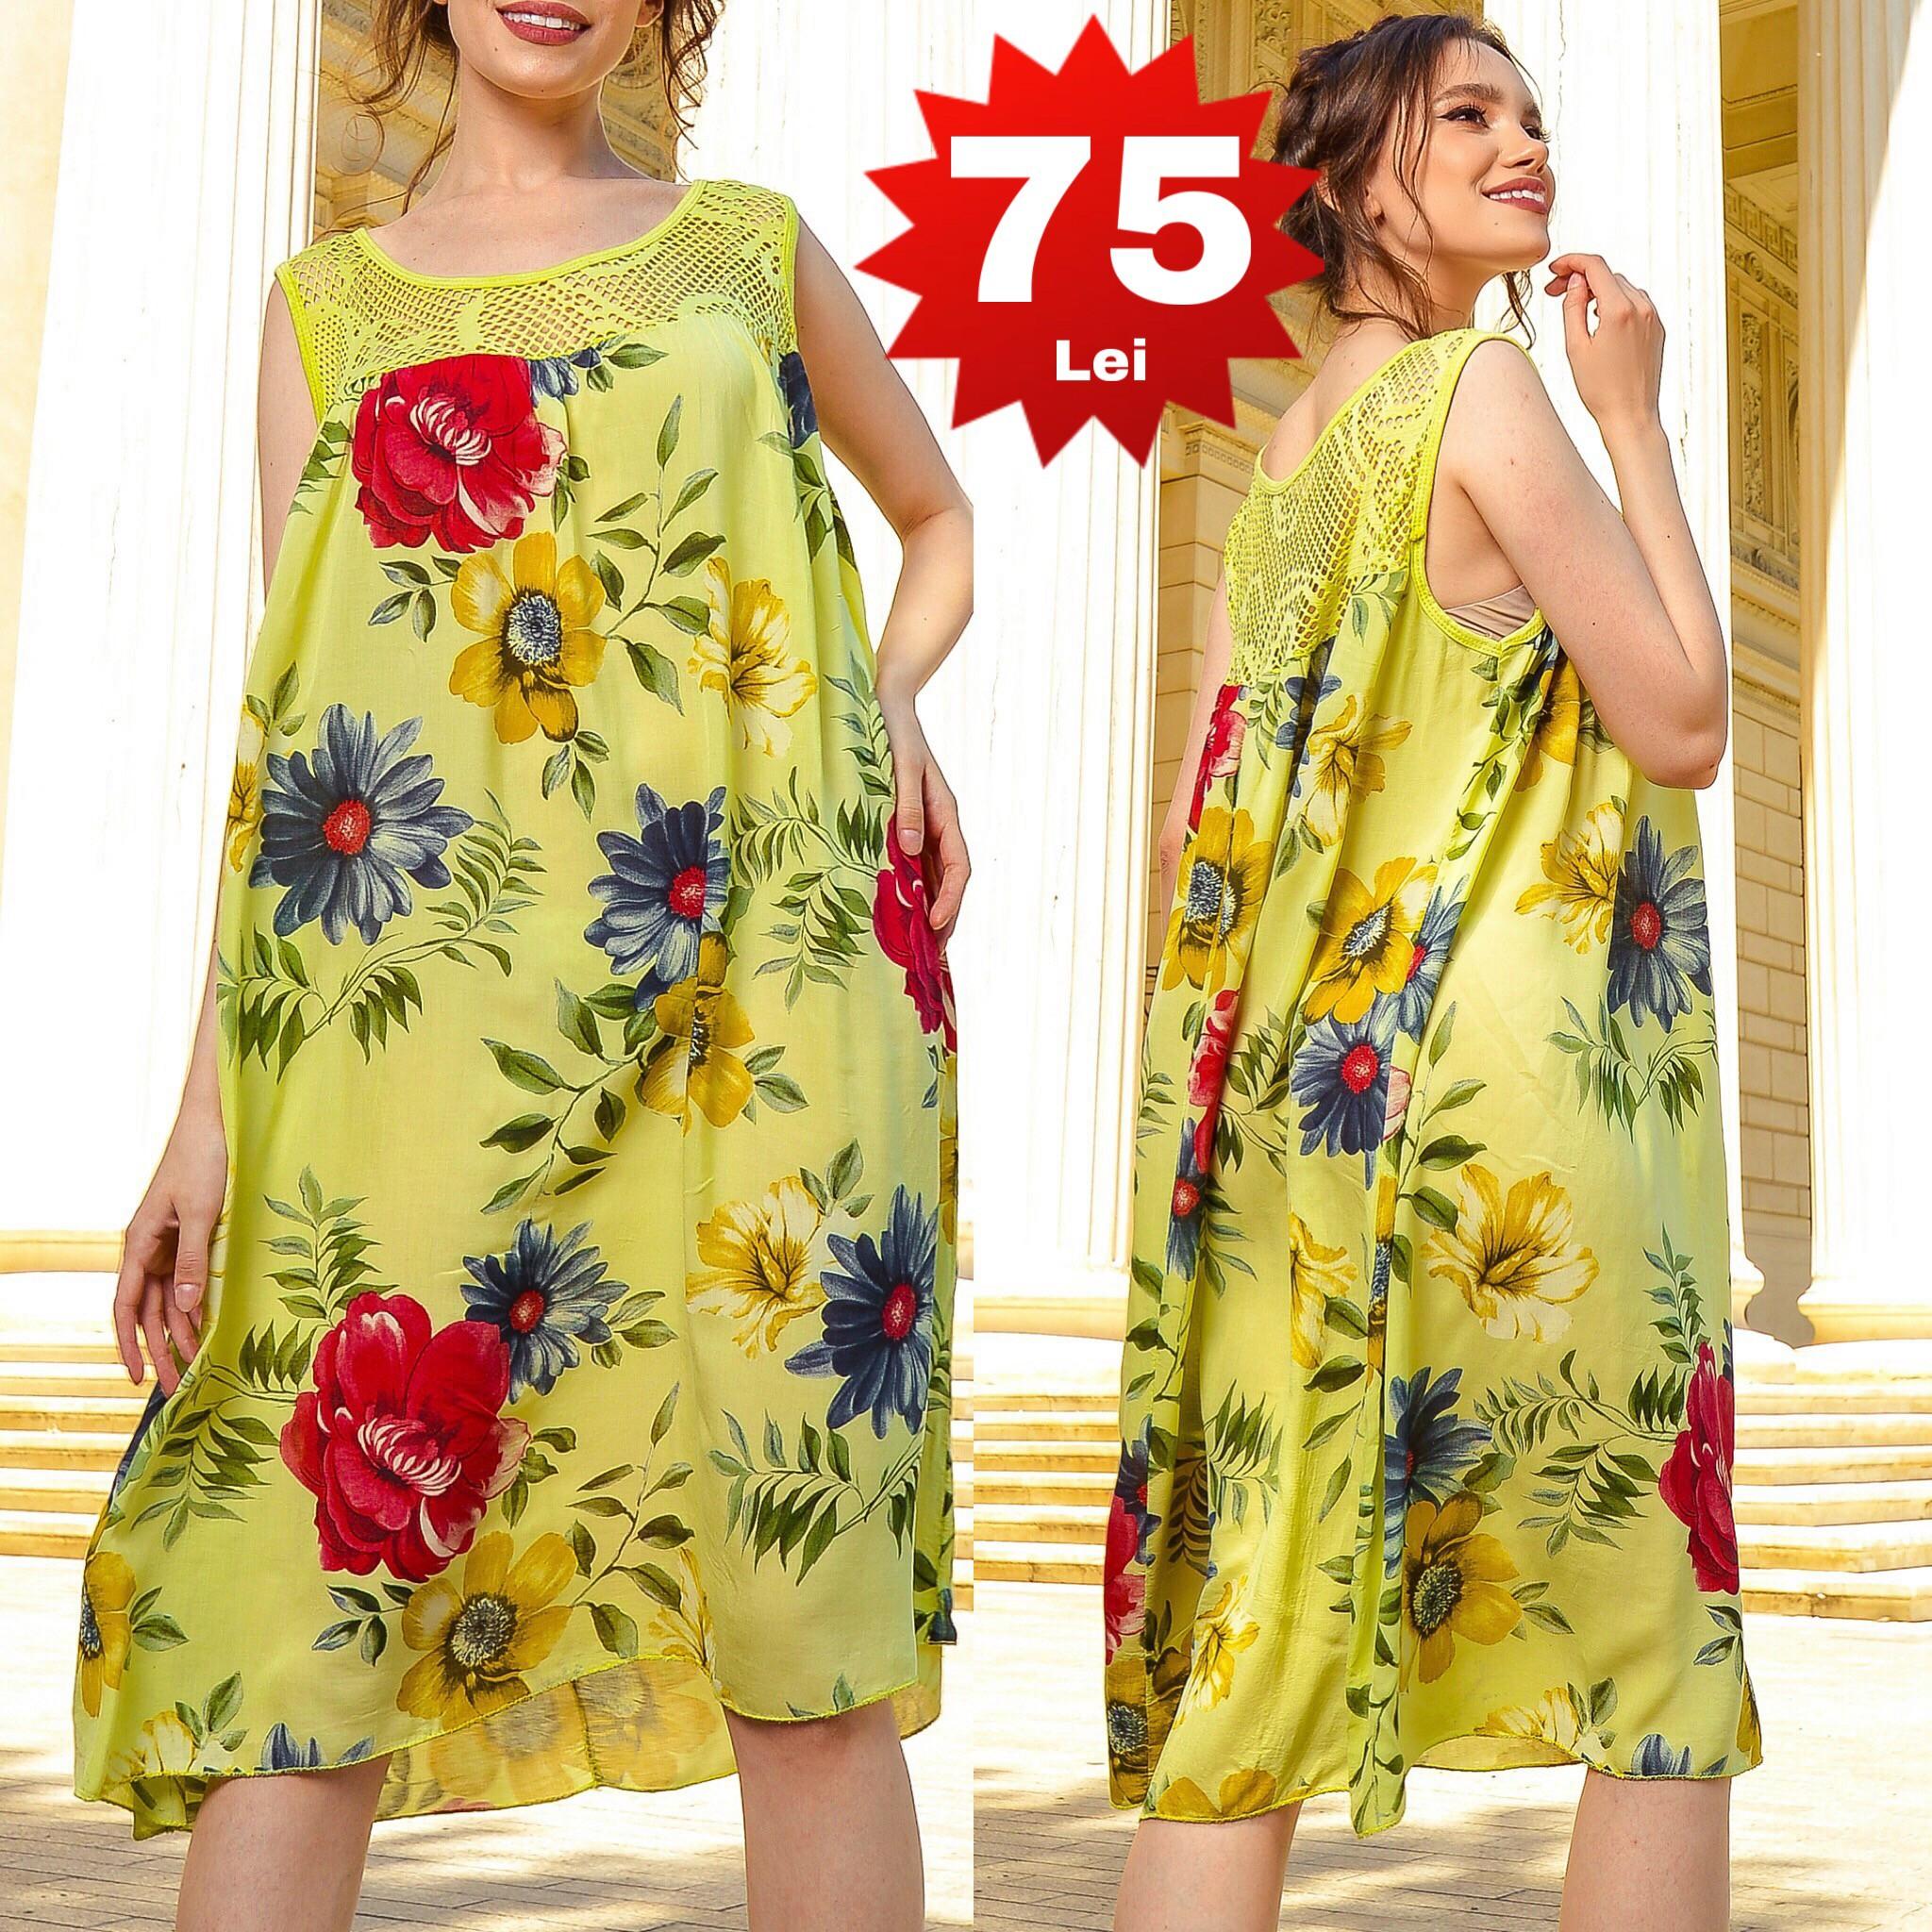 Rochie galbena vaporoasa cu imprimeu floral si dantela crosetata 01